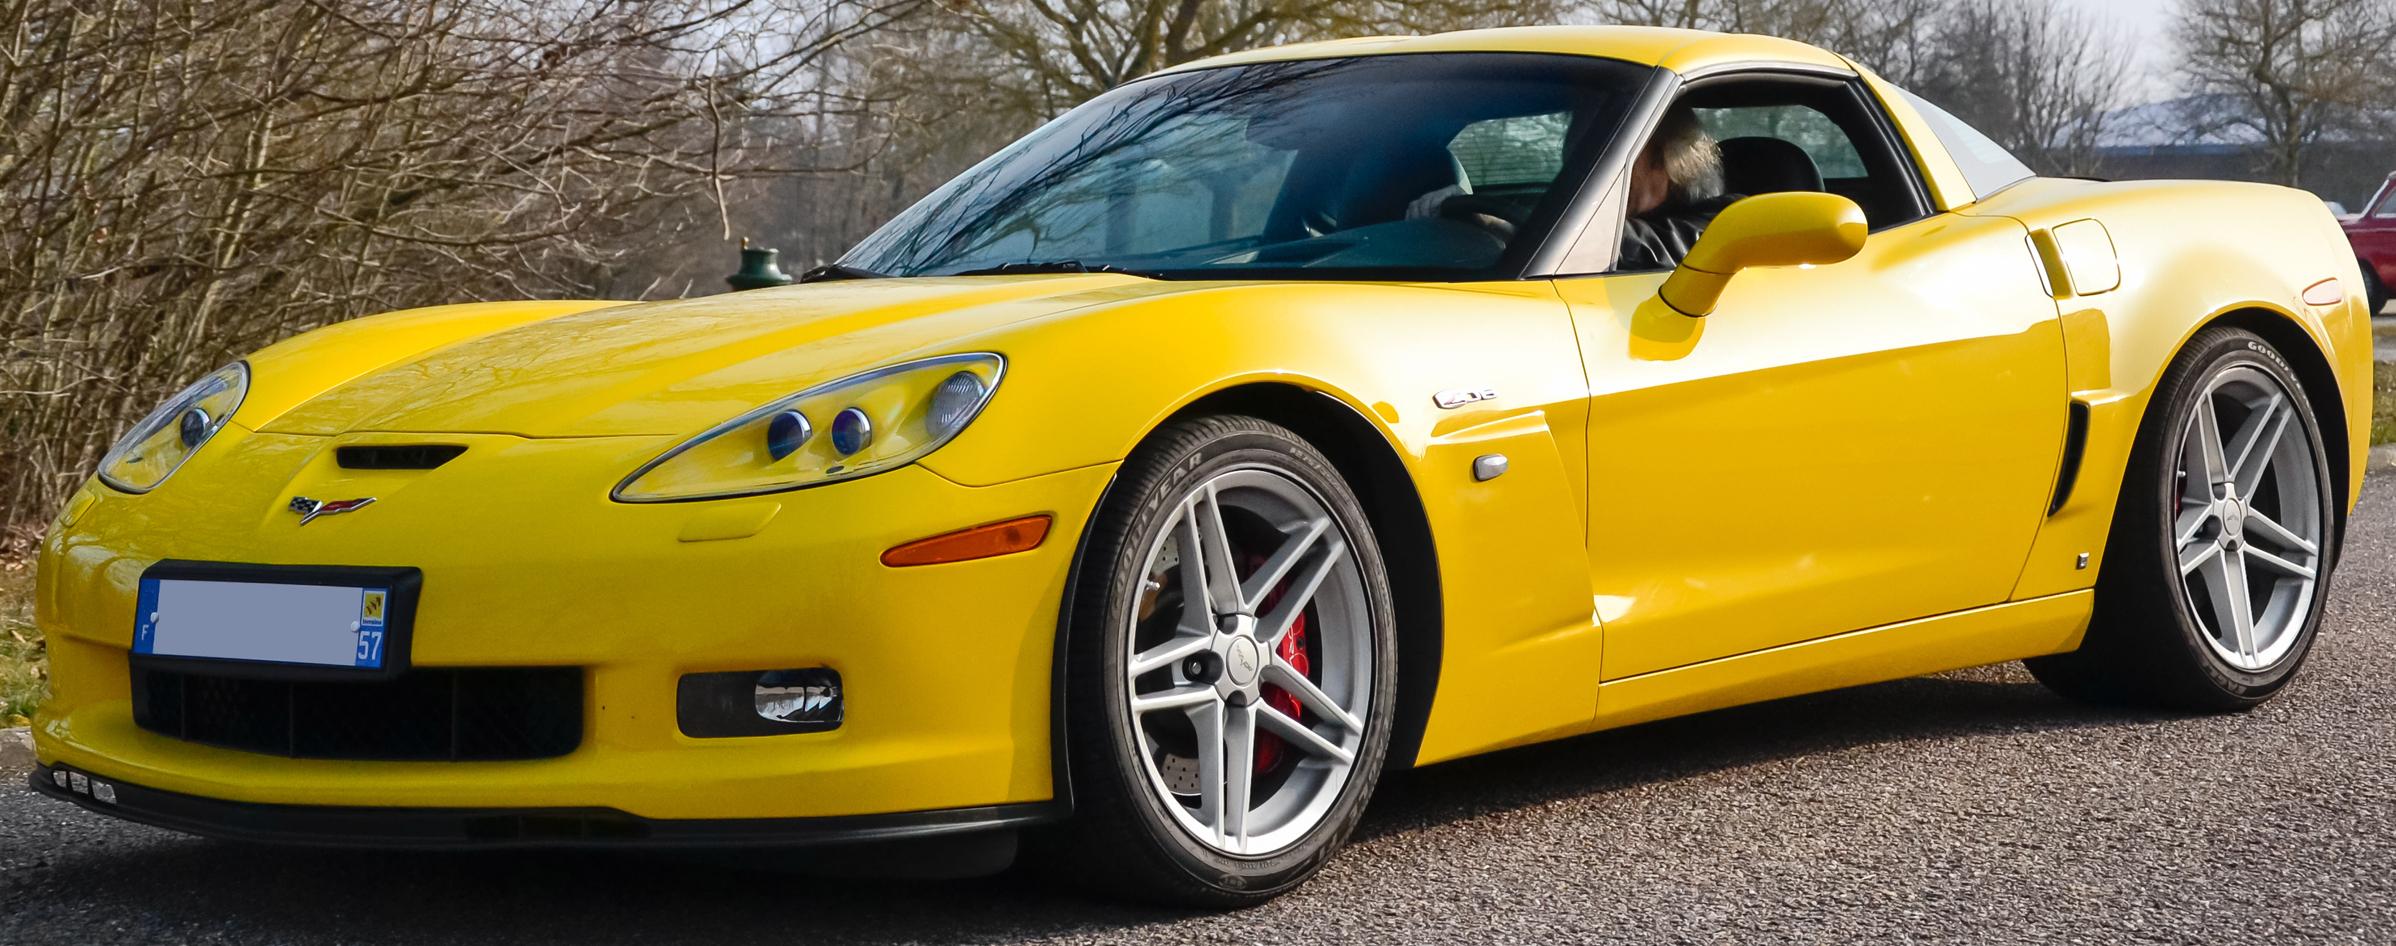 Kelebihan Kekurangan Corvette Z6 Murah Berkualitas